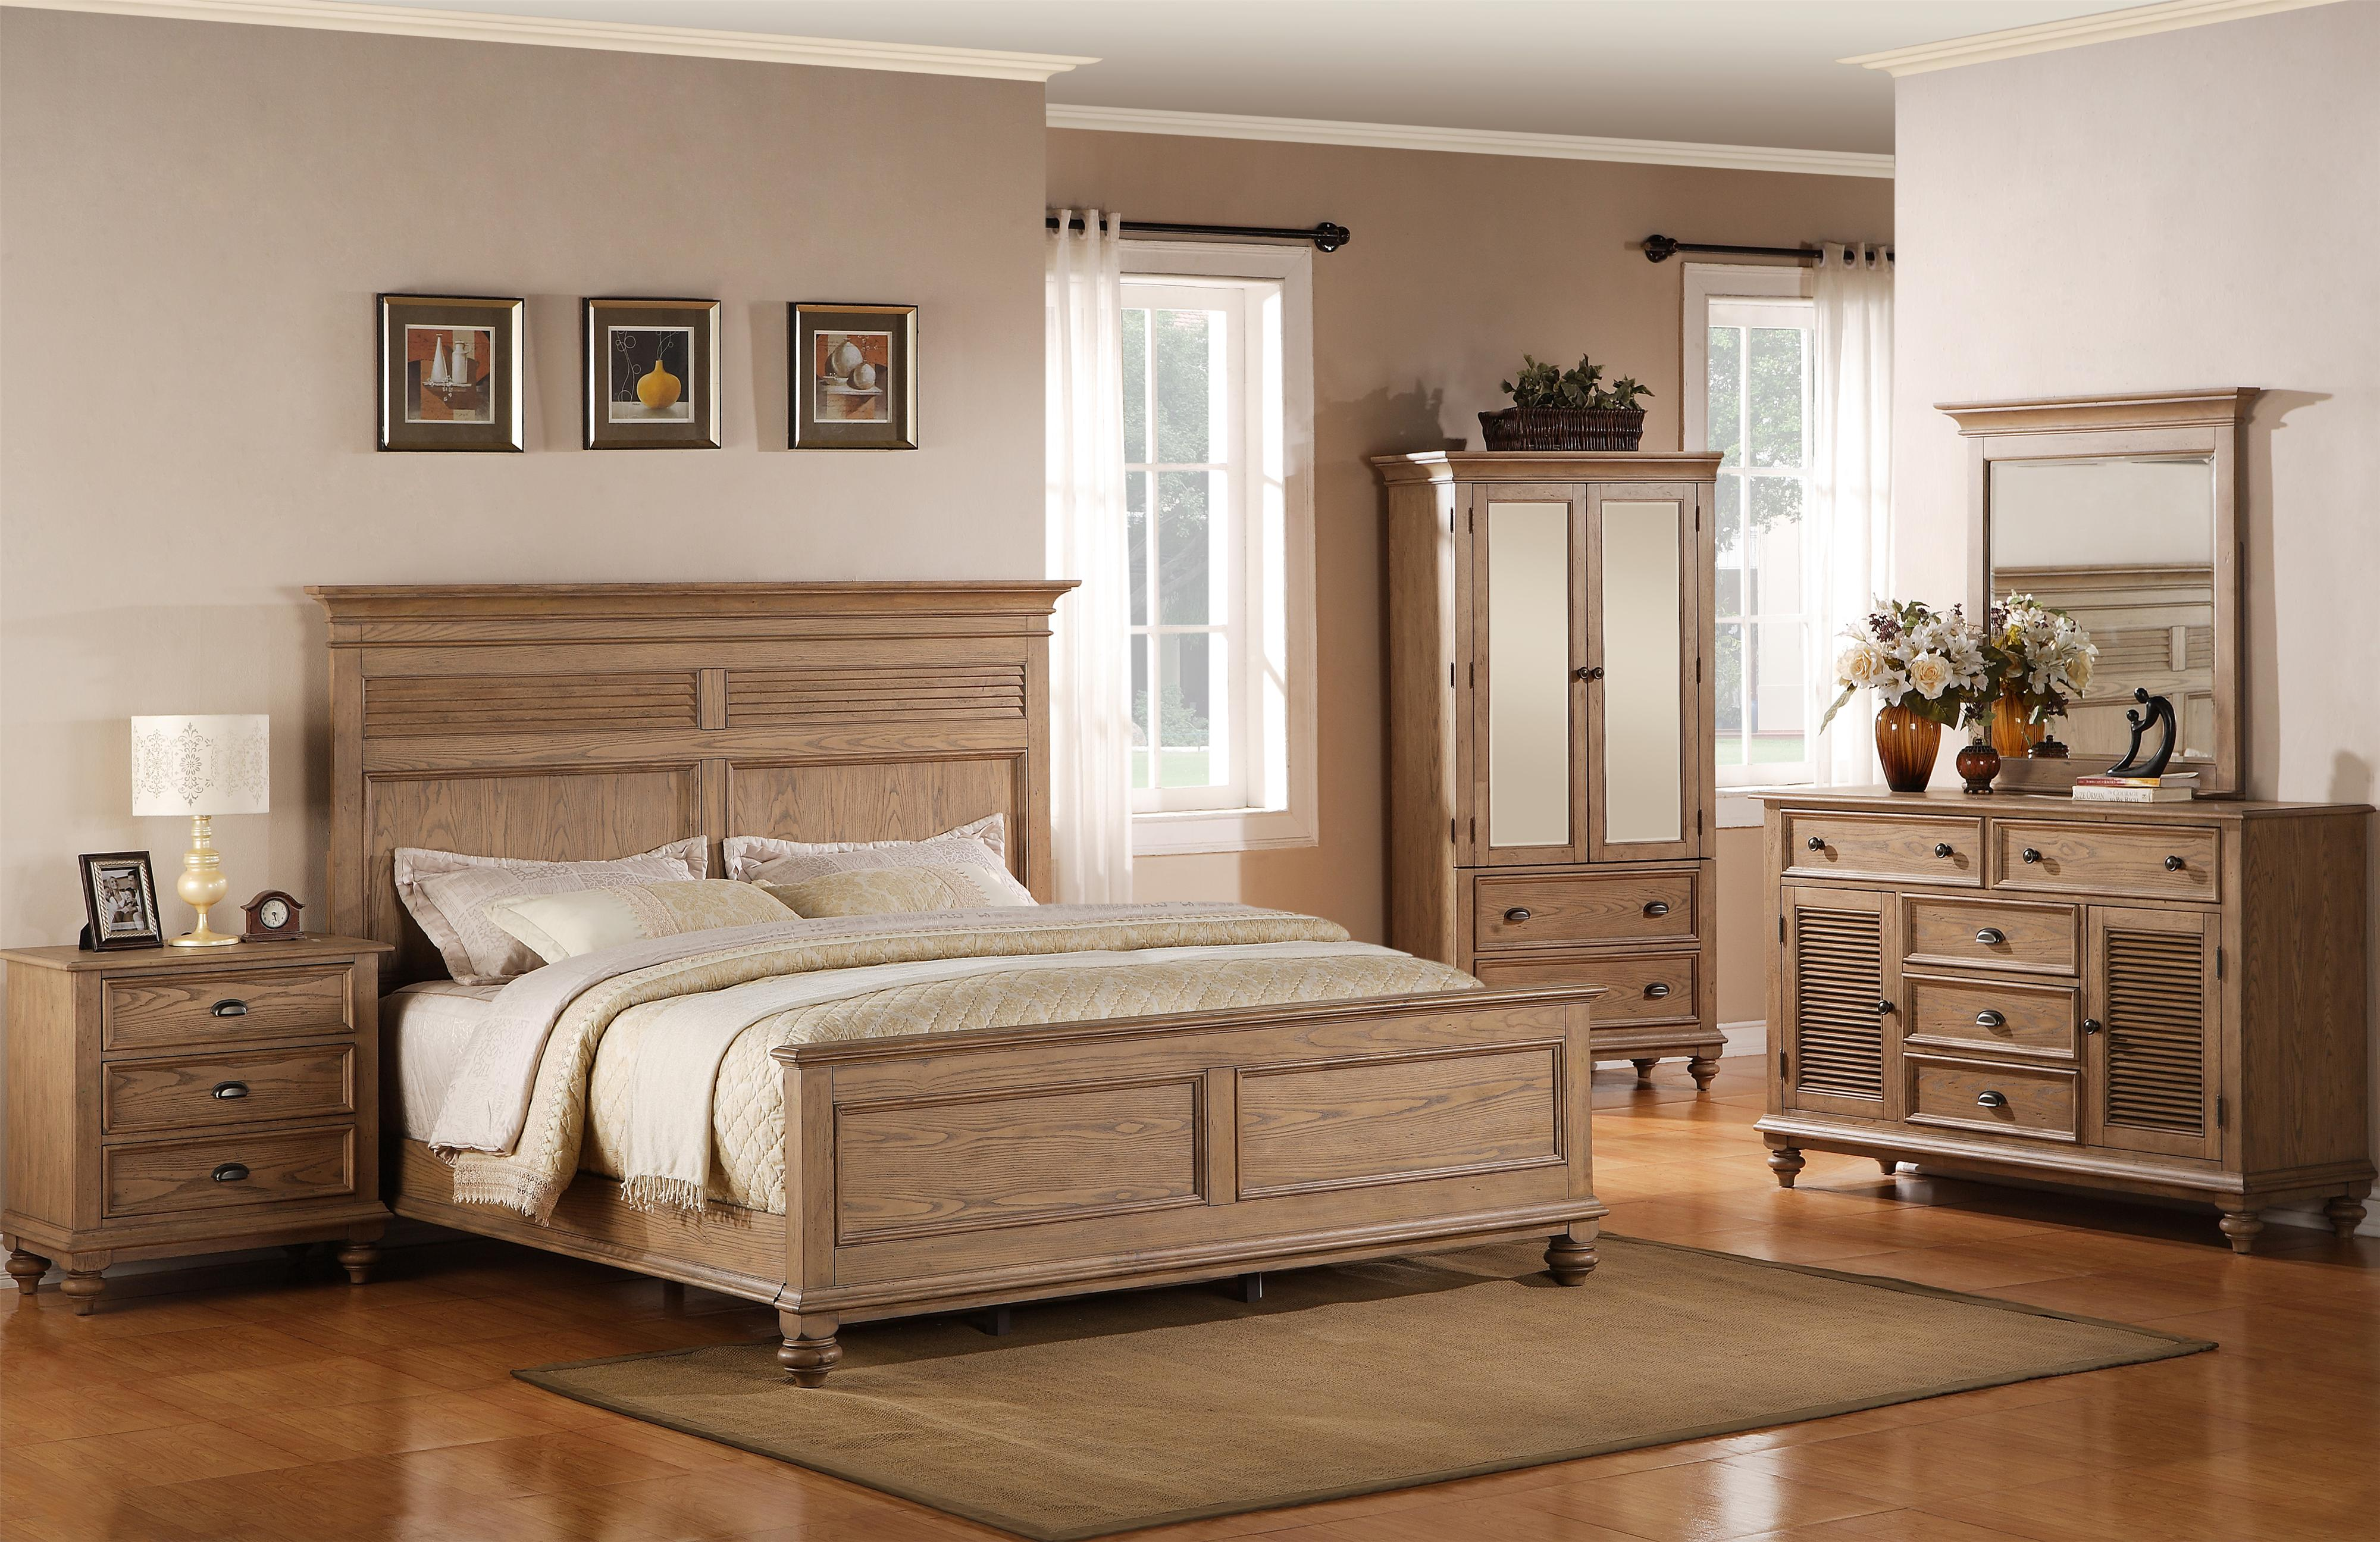 queen headboard king riverside headboards fullqueen seagrass vagabond full woven twin wood furniture bennington bedroom